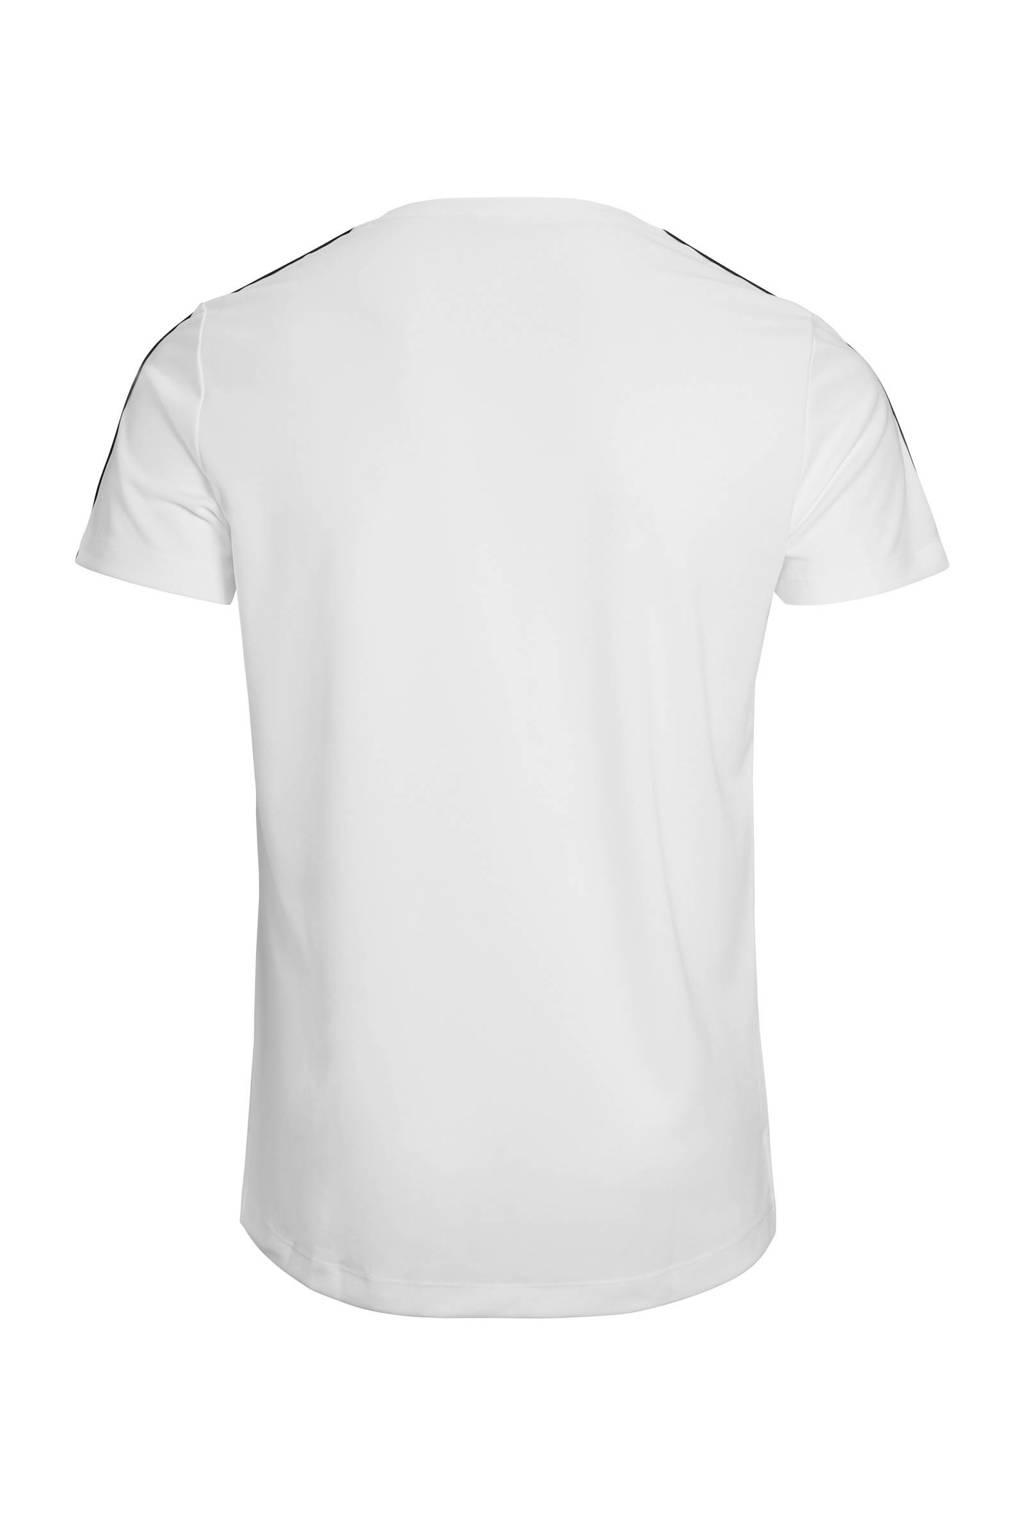 Björn Borg   sport T-shirt wit, Wit